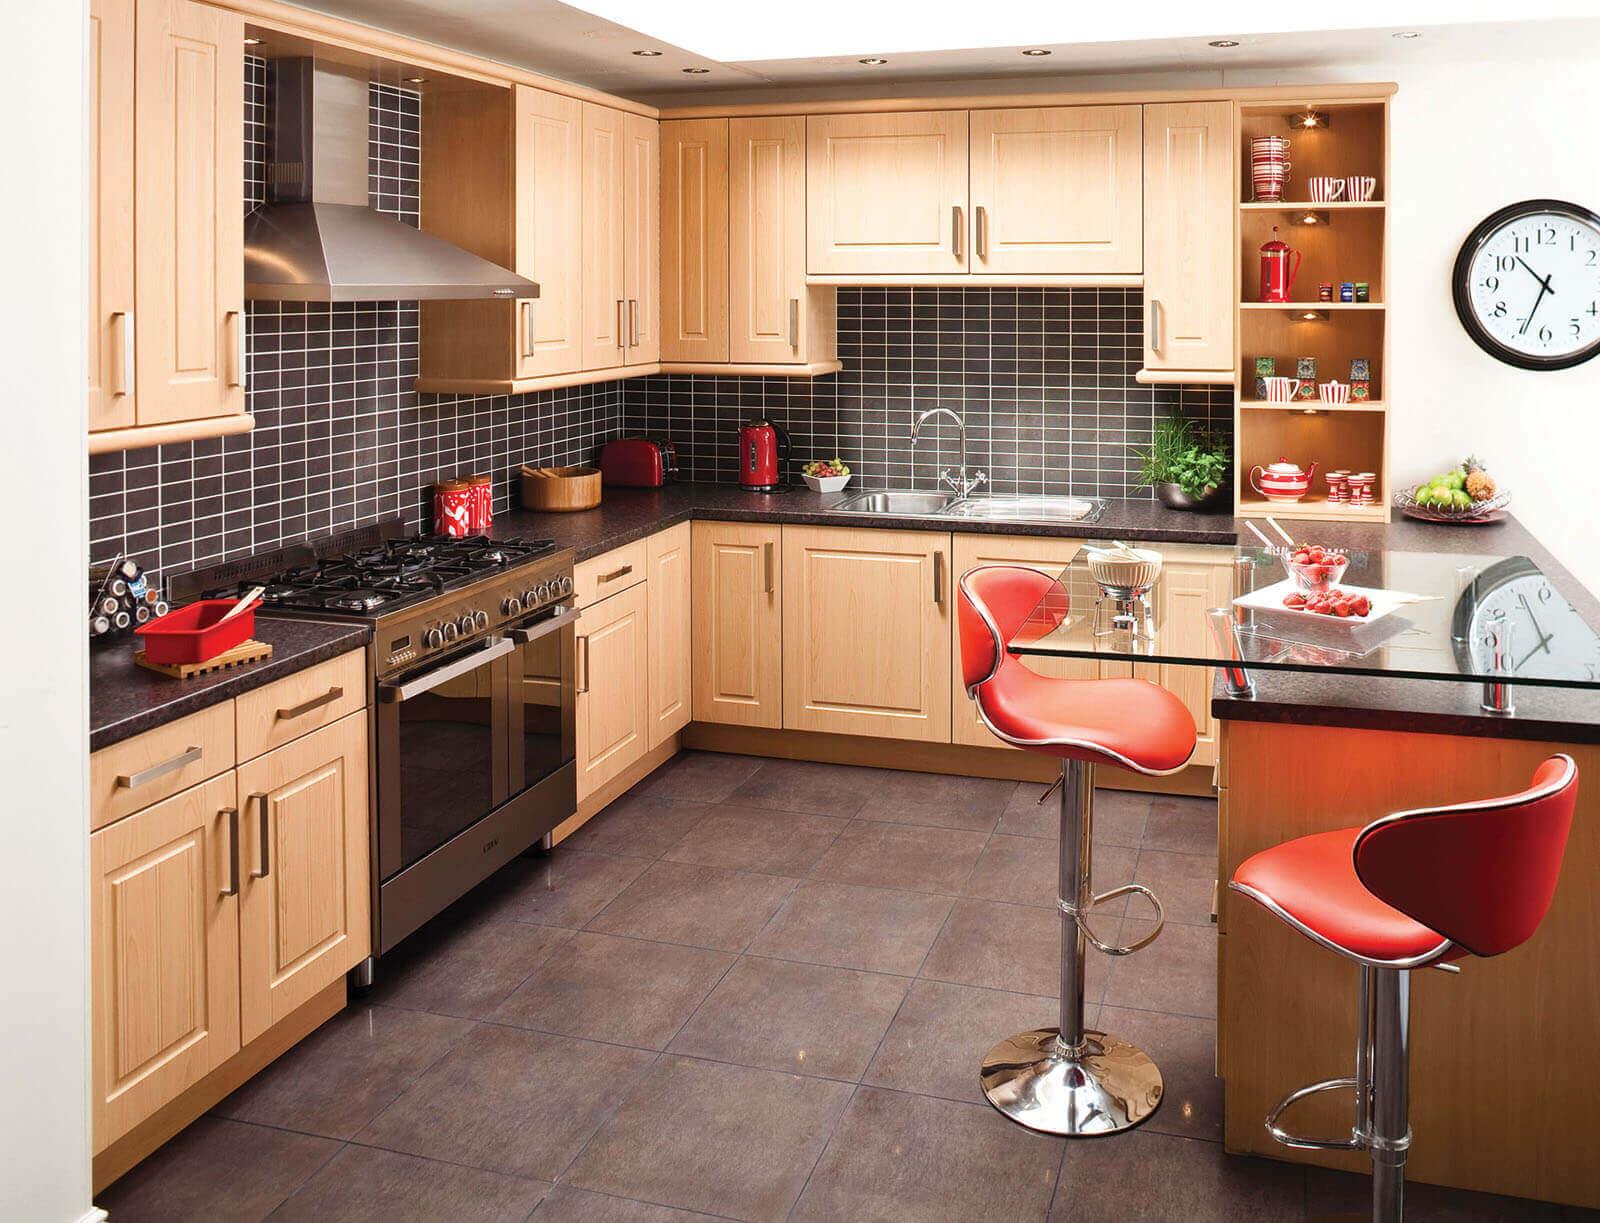 Contemporary Kitchen Tiles for Backsplash